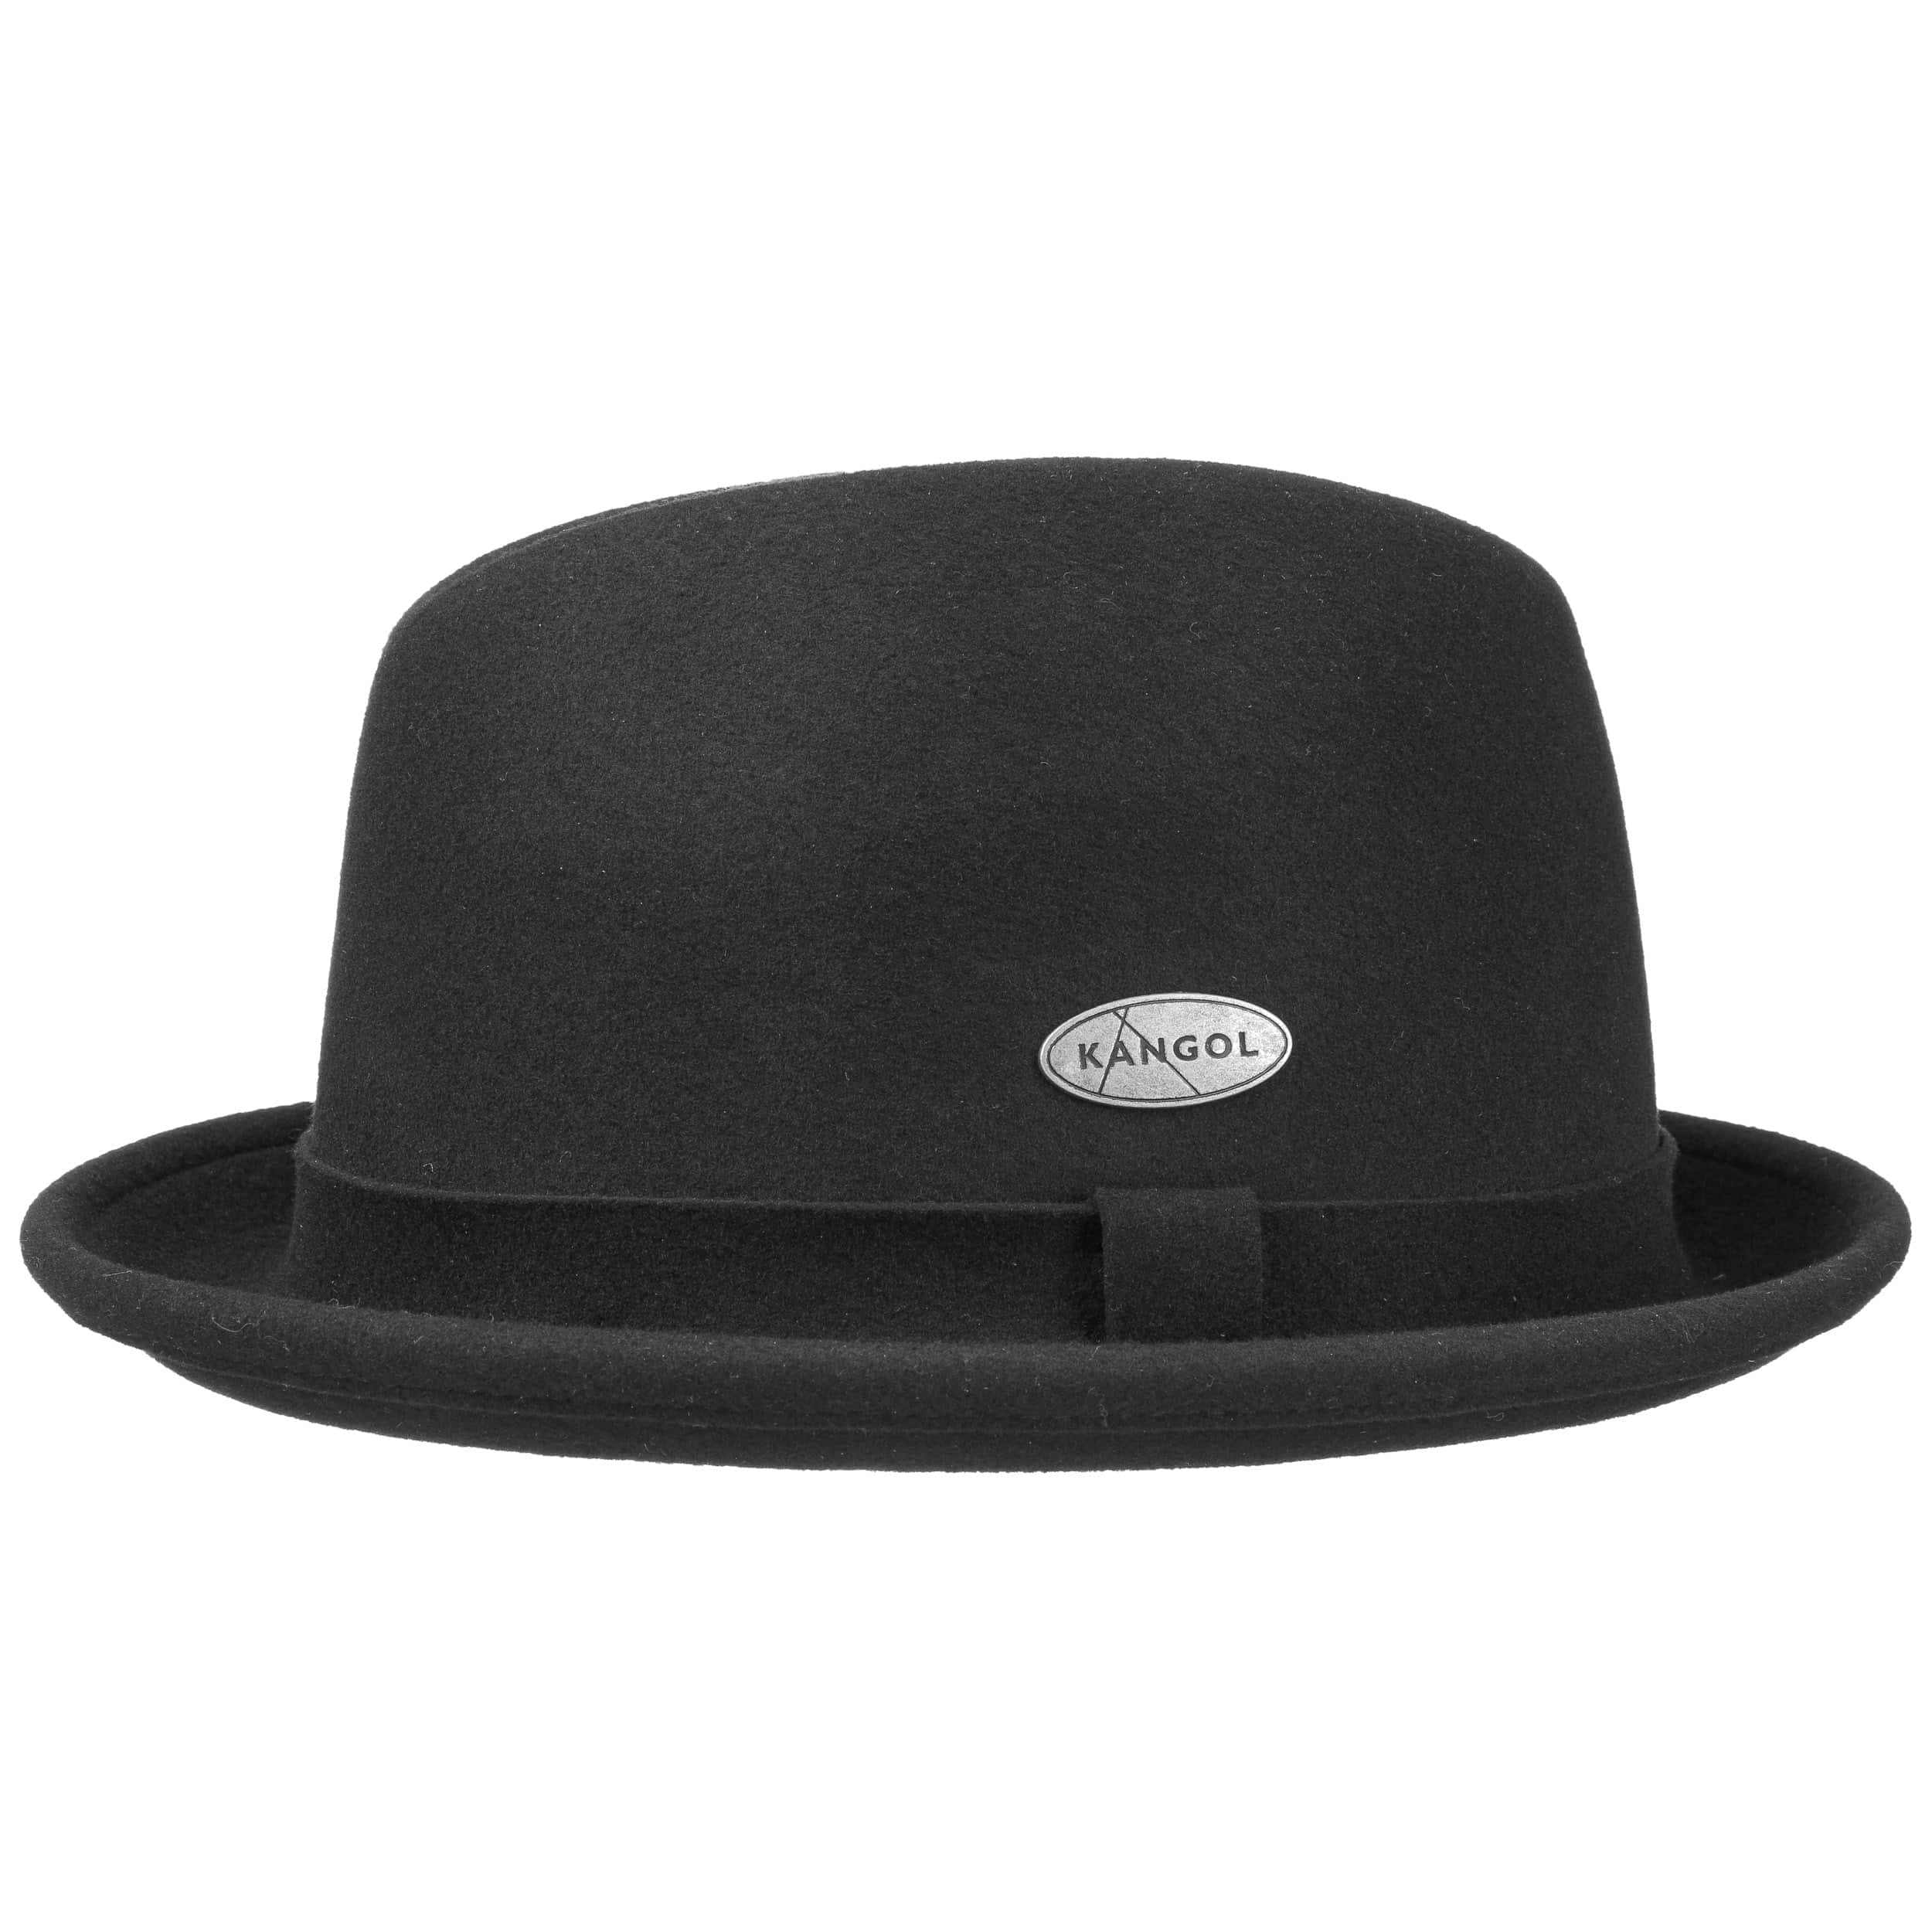 6e6e04ede26c1 Sombrero Kangol Lite Felt Player - Sombreros - sombreroshop.es